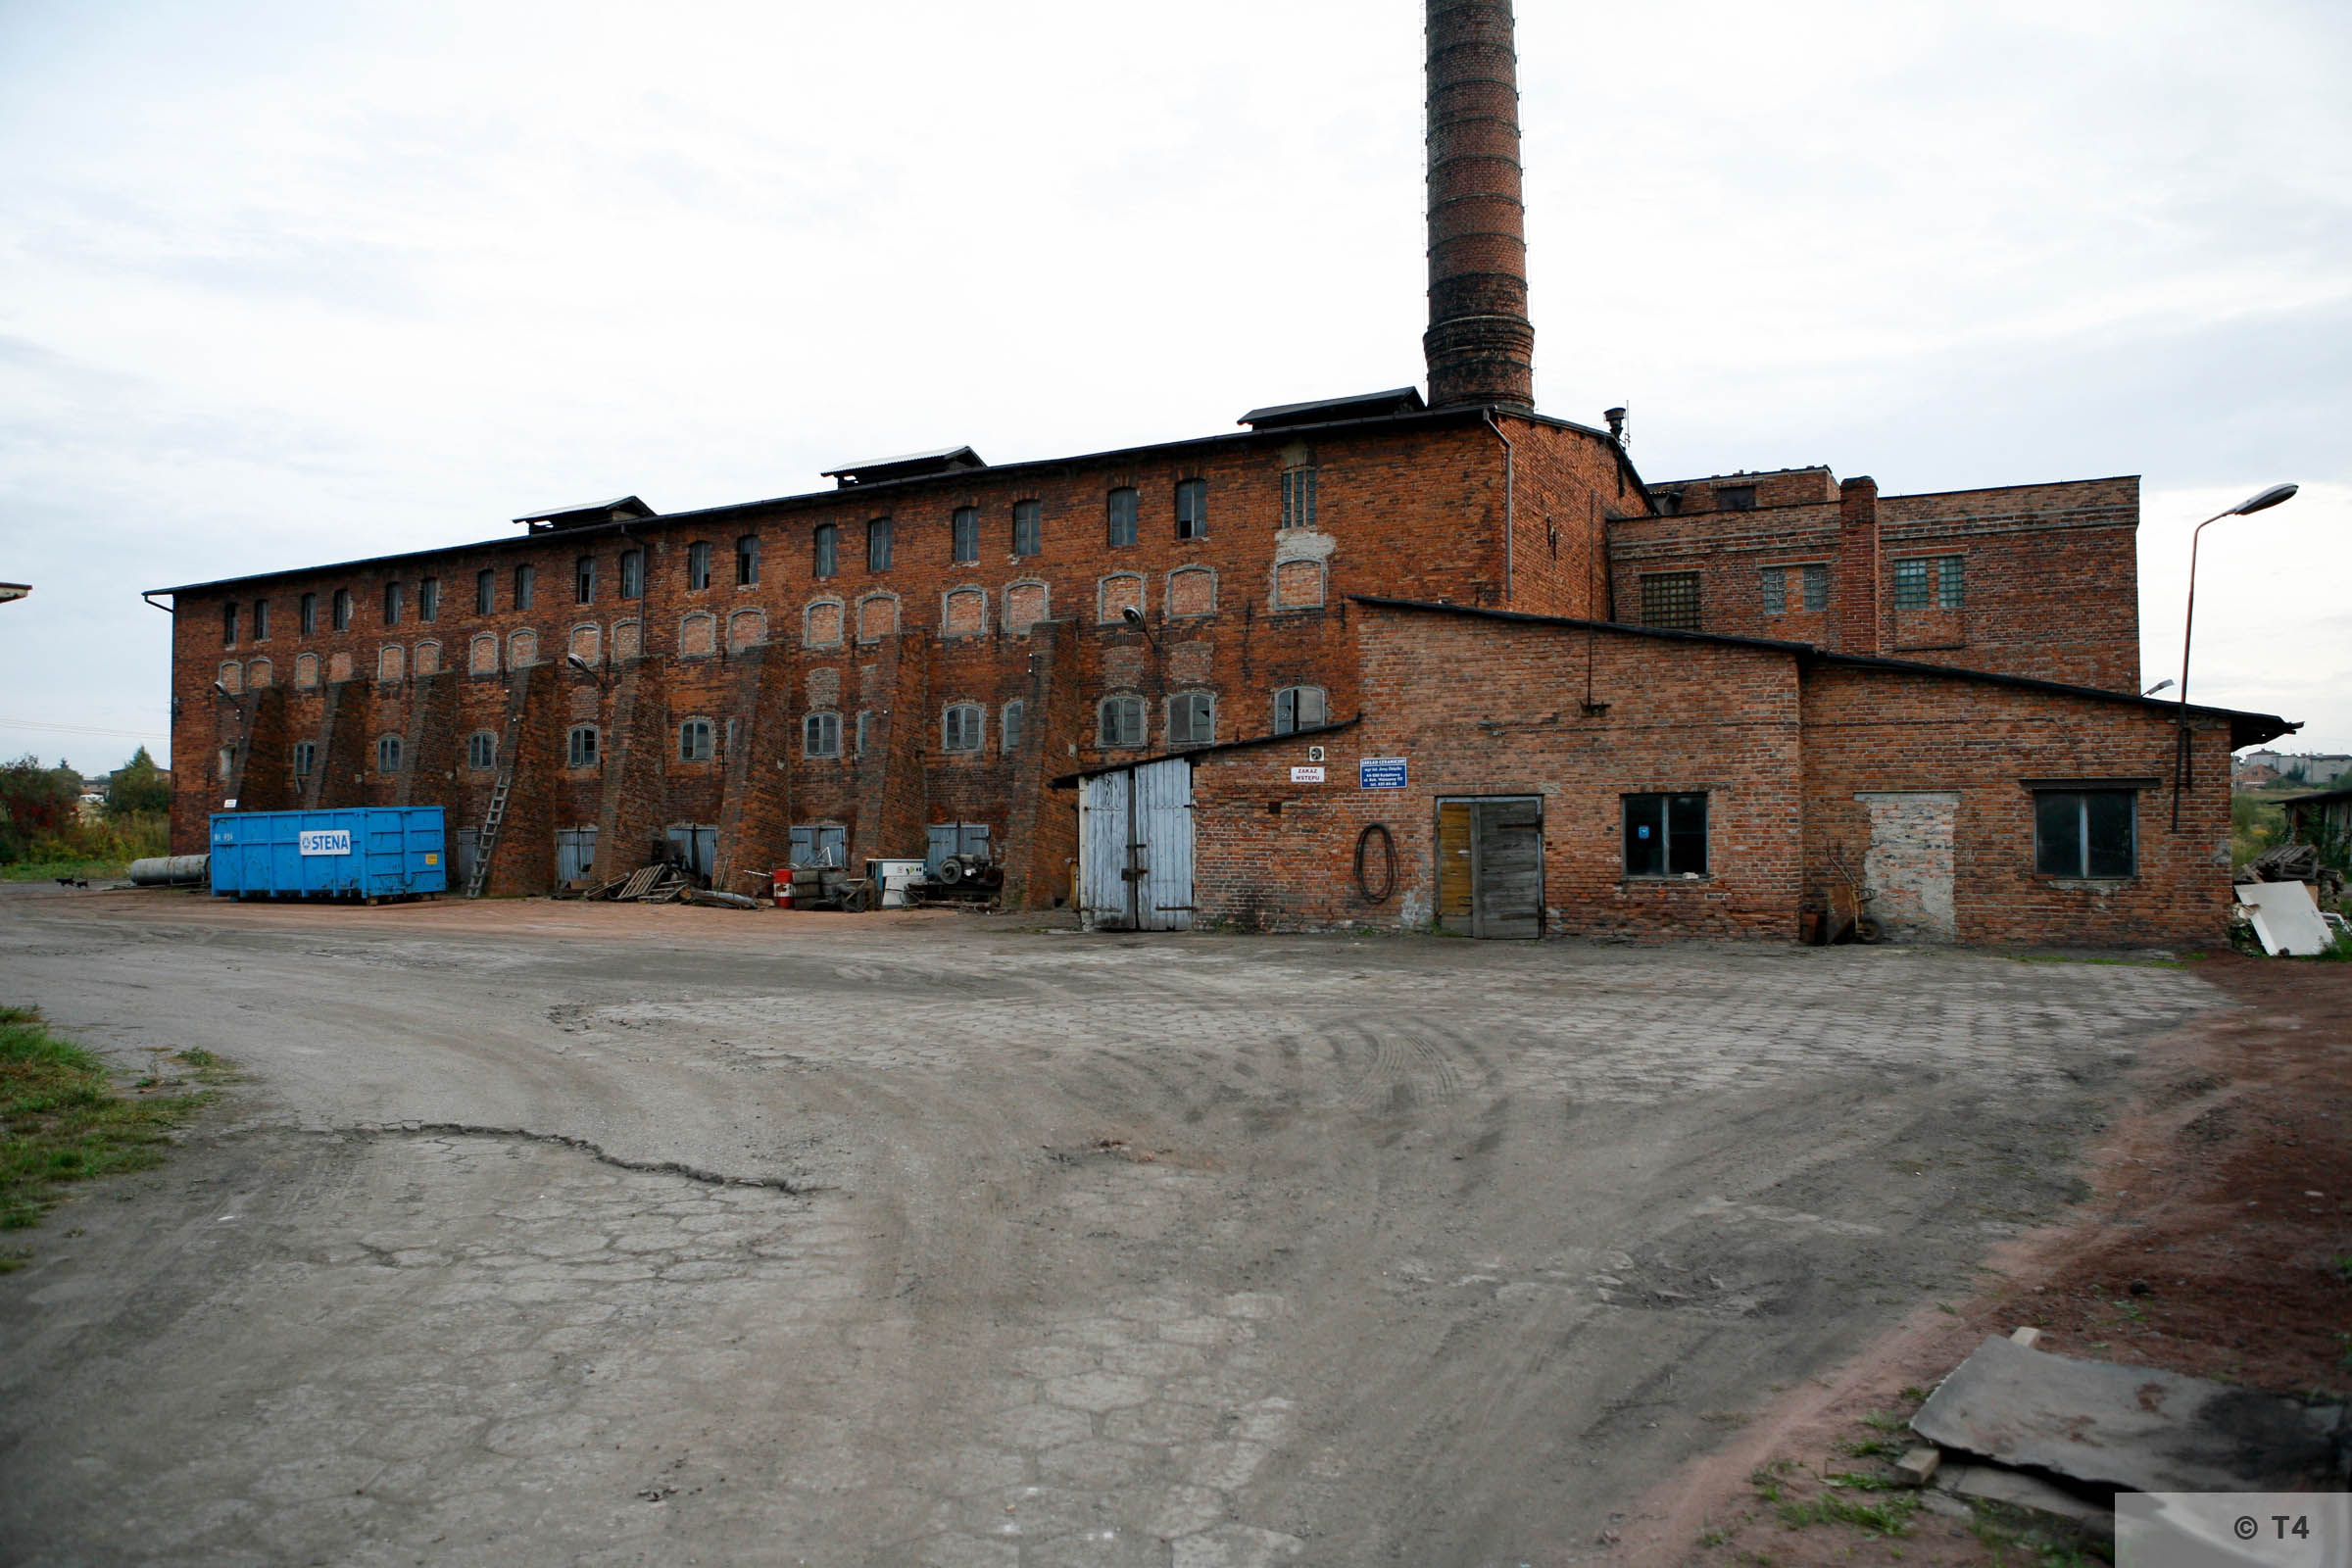 Former Hercer brickyard. 2006 T4 3594